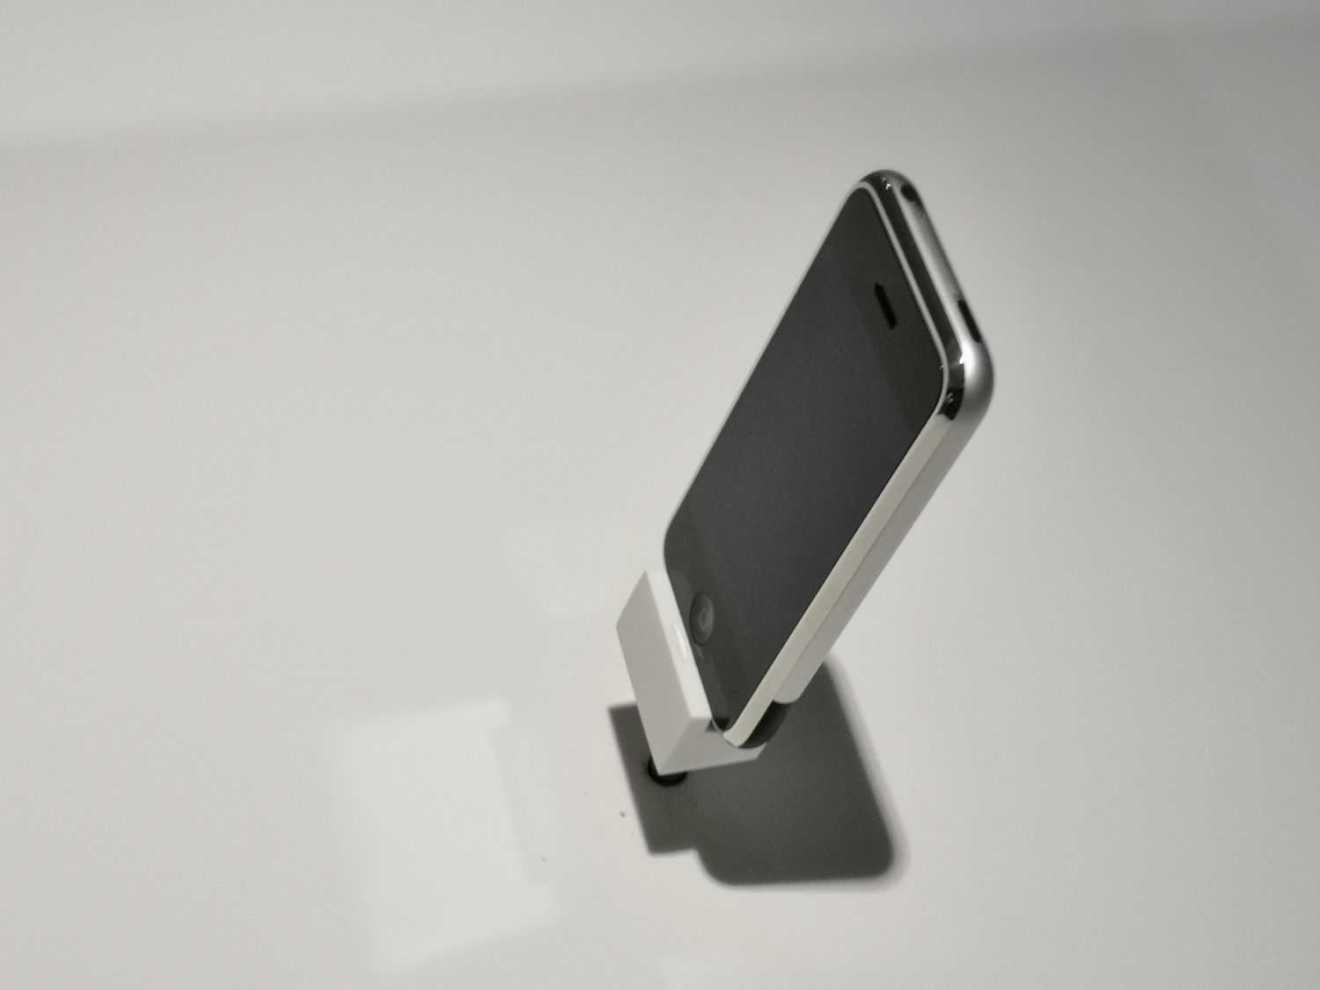 Apple Museum Prague 19 - Posjetili smo Apple Museum u Pragu i vidjeli prototip prvog iPhone mobitela